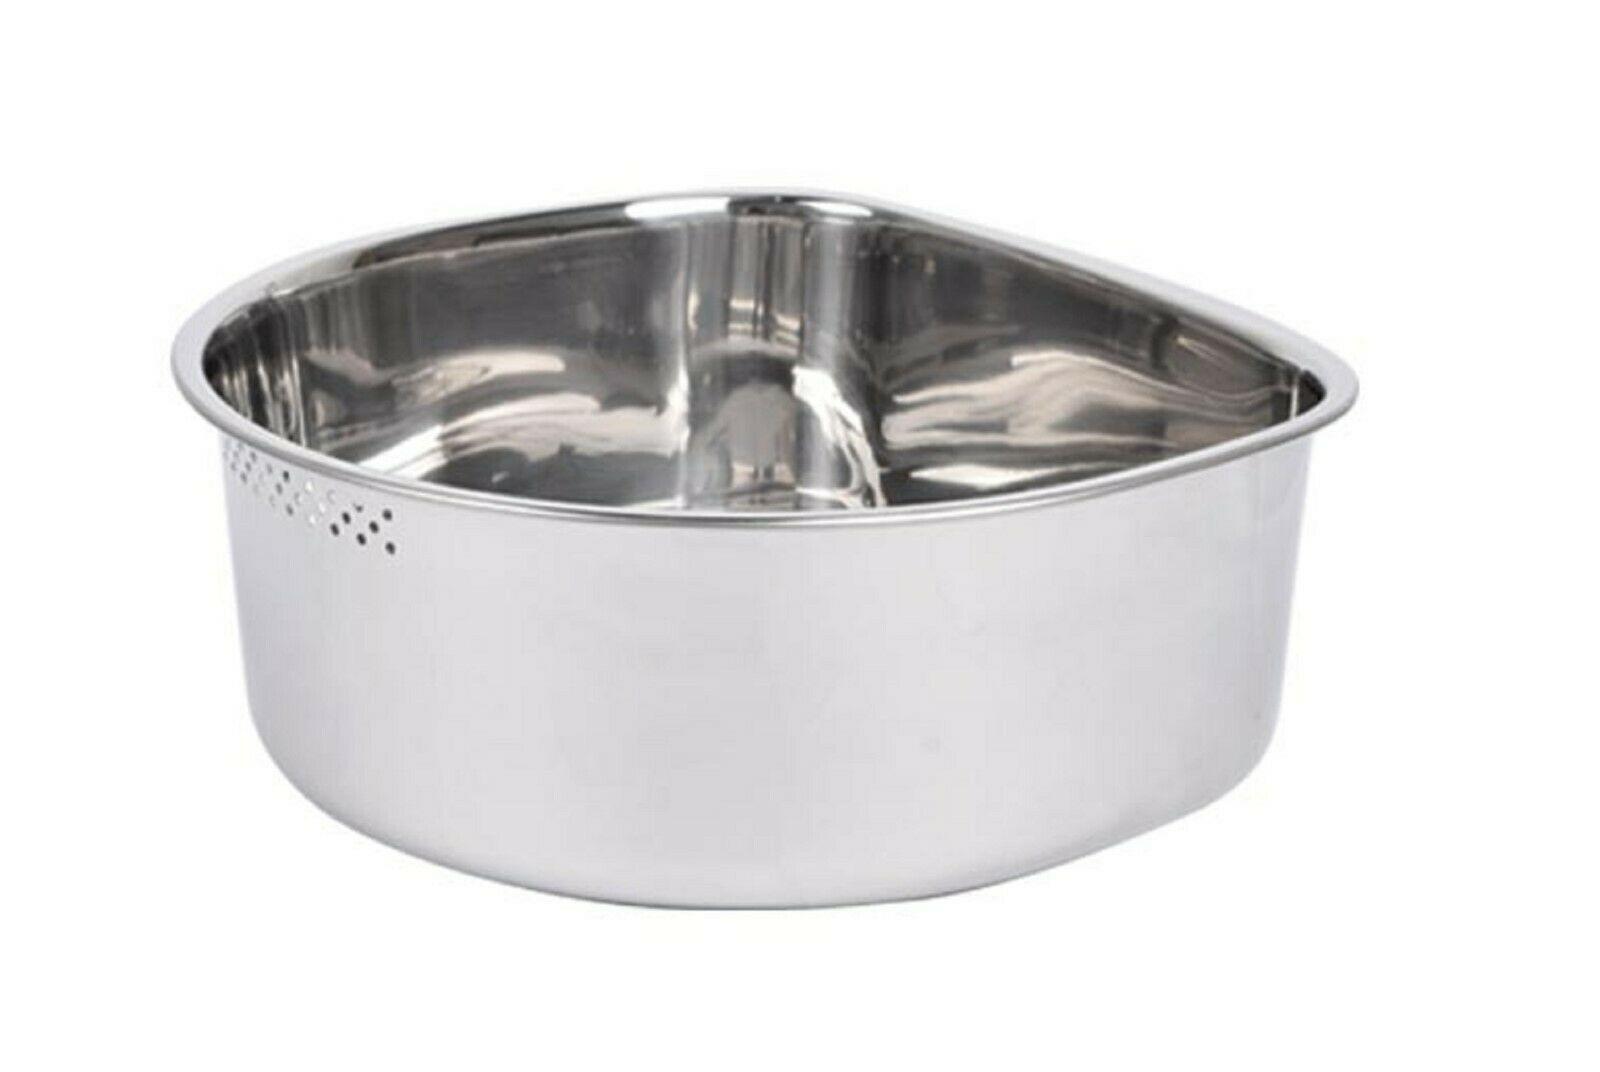 Characin Stainless Steel Dishpan Basin Dish Washing Bowl Portable Tub (D Shape)